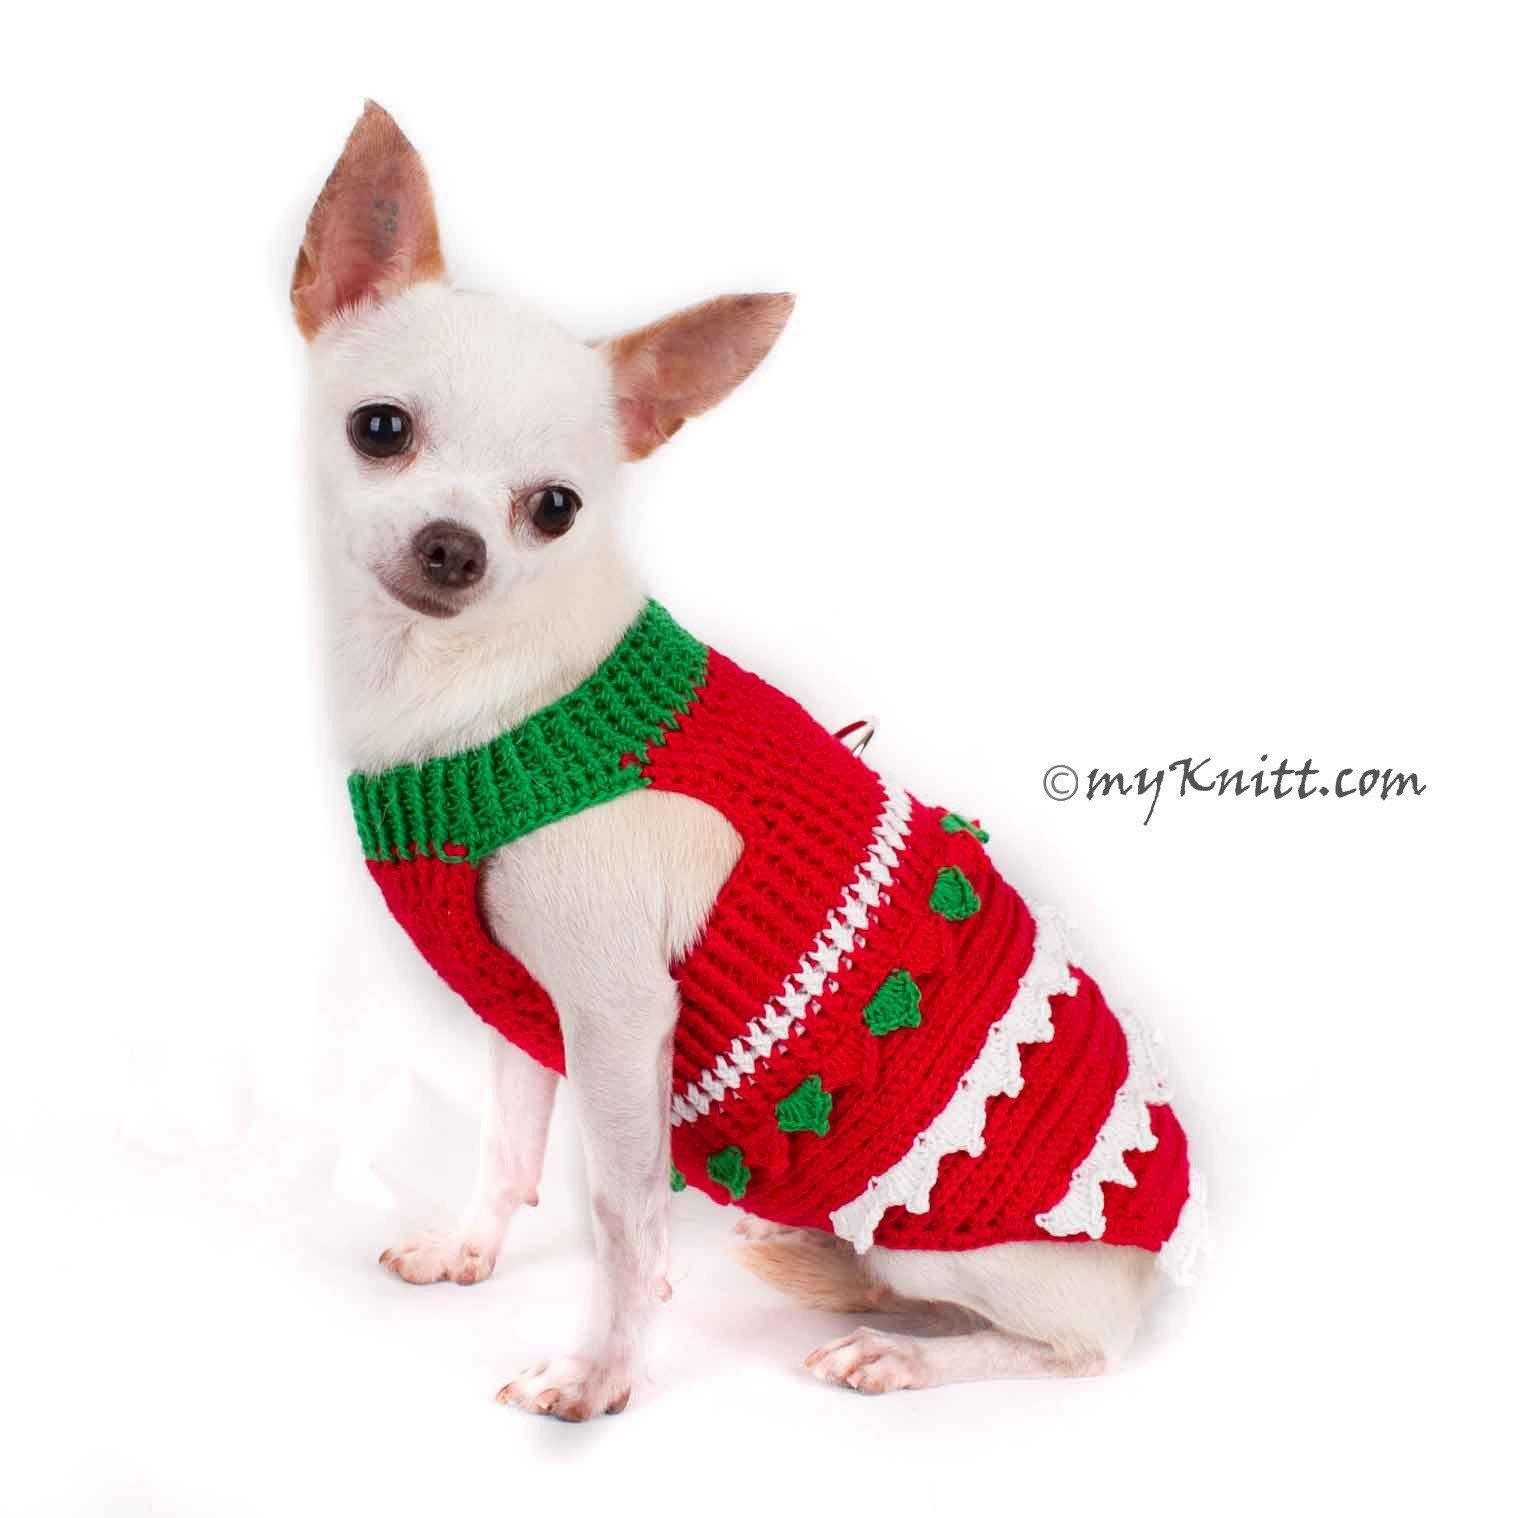 Christmas Tree Chihuahua Clothes Crochet Dog Sweater DF1 | Myknitt ...